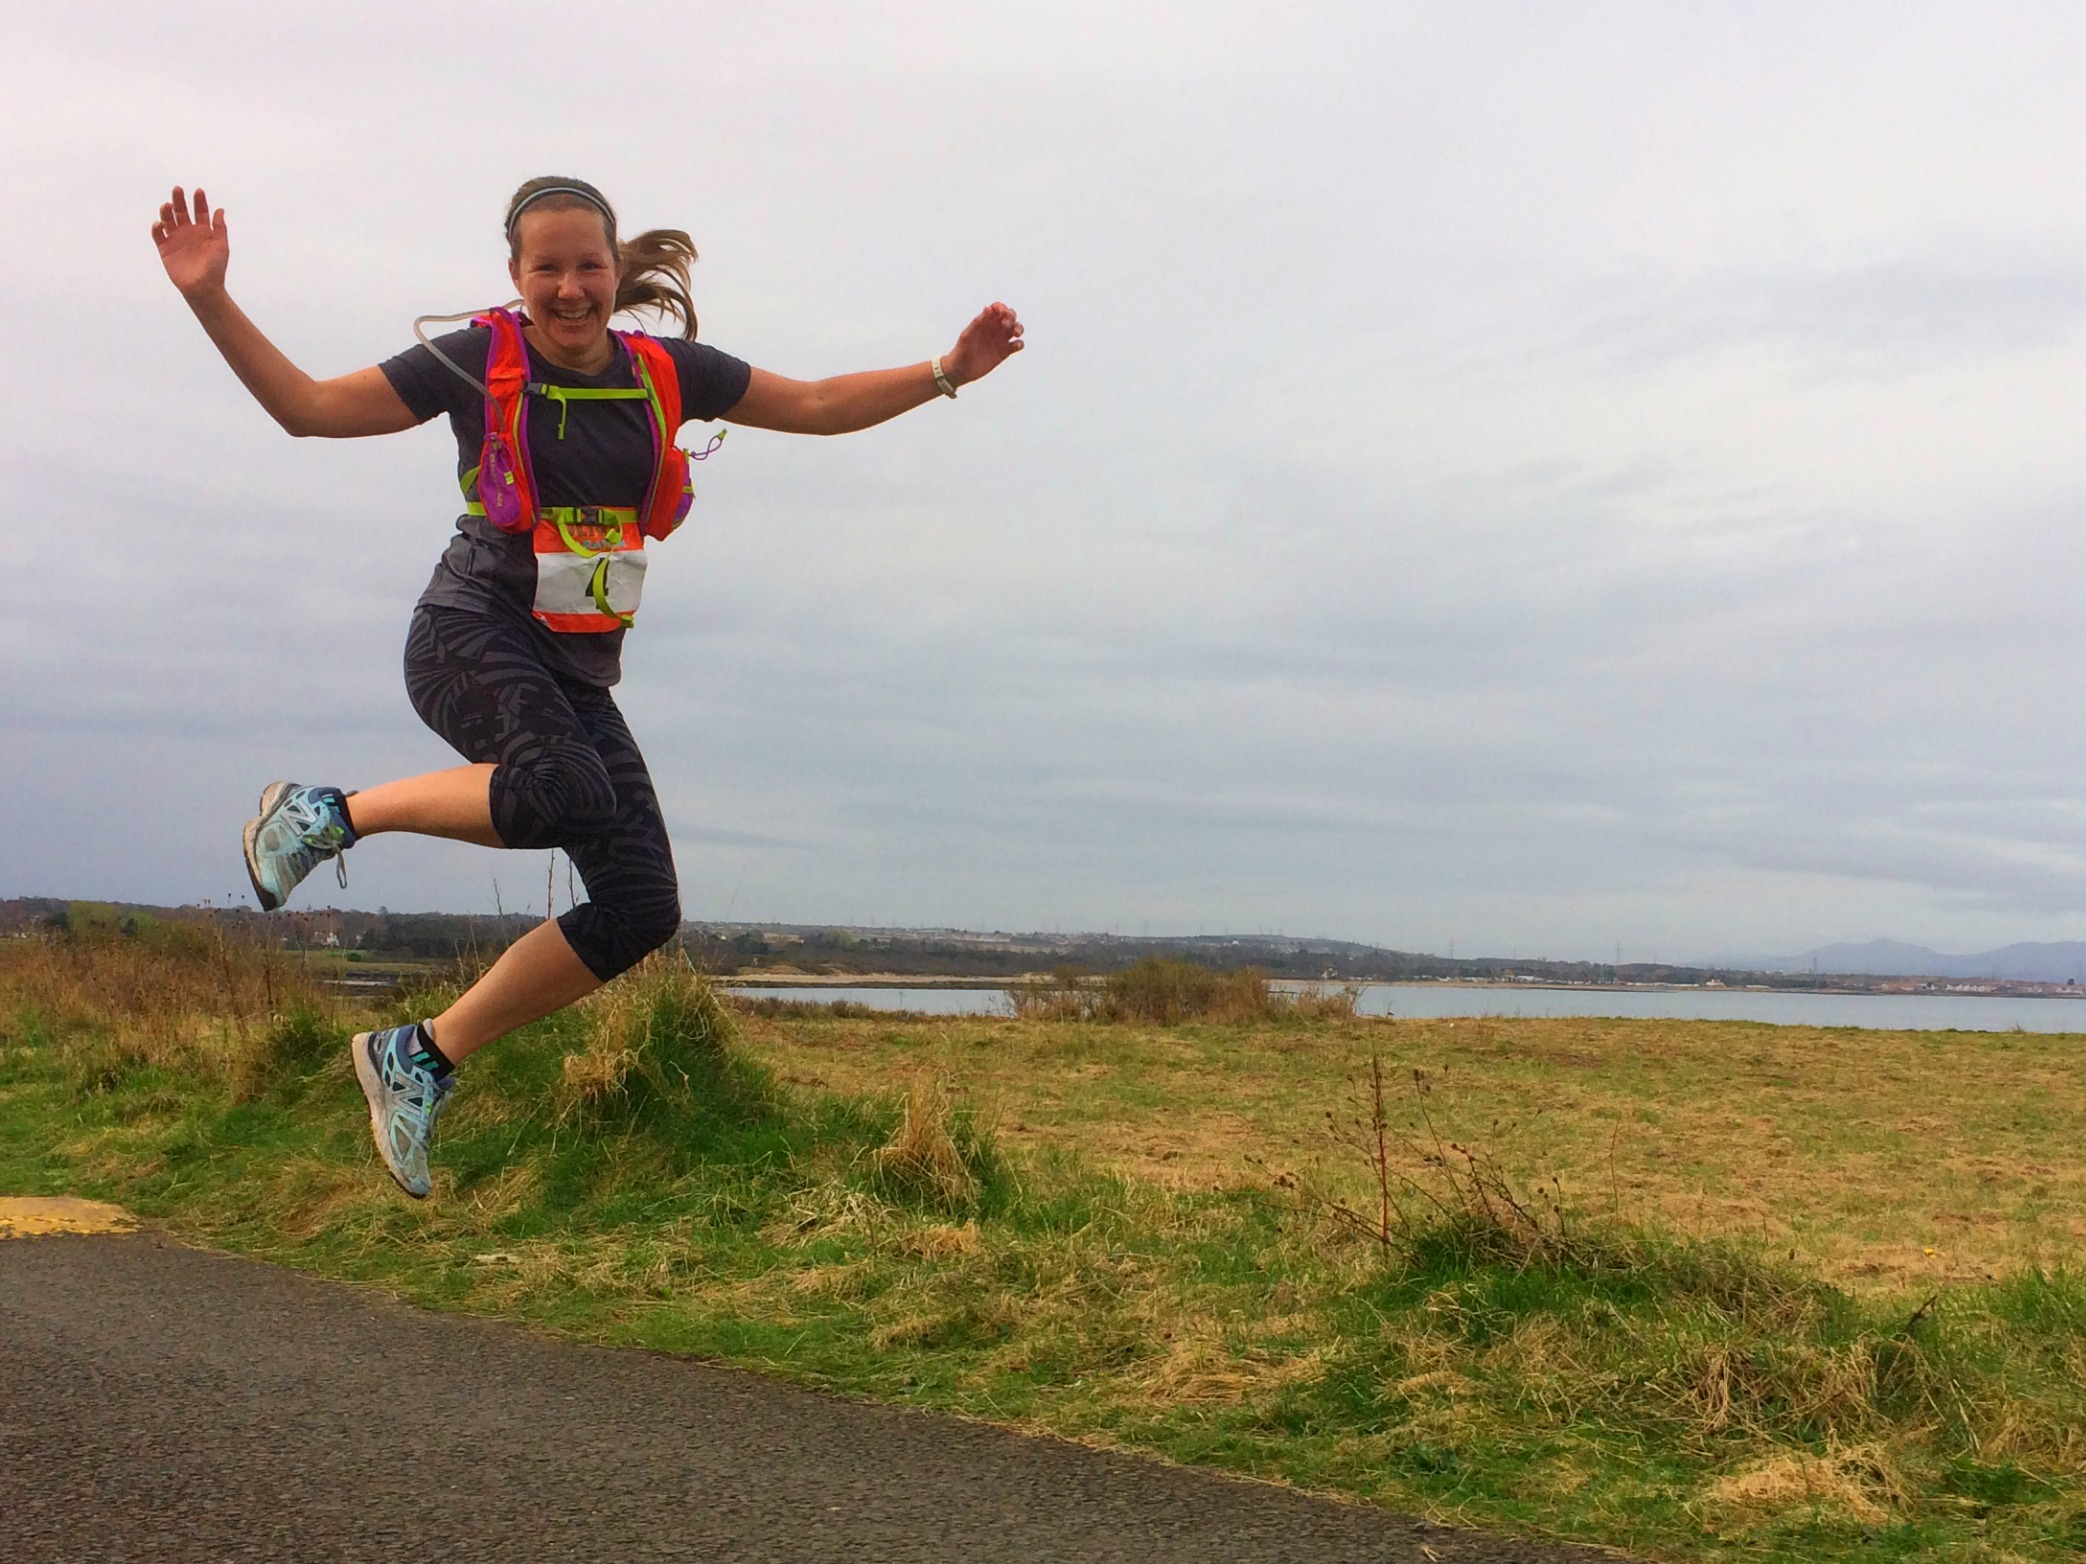 Steph Valentin jumping for joy at Longniddry Bents